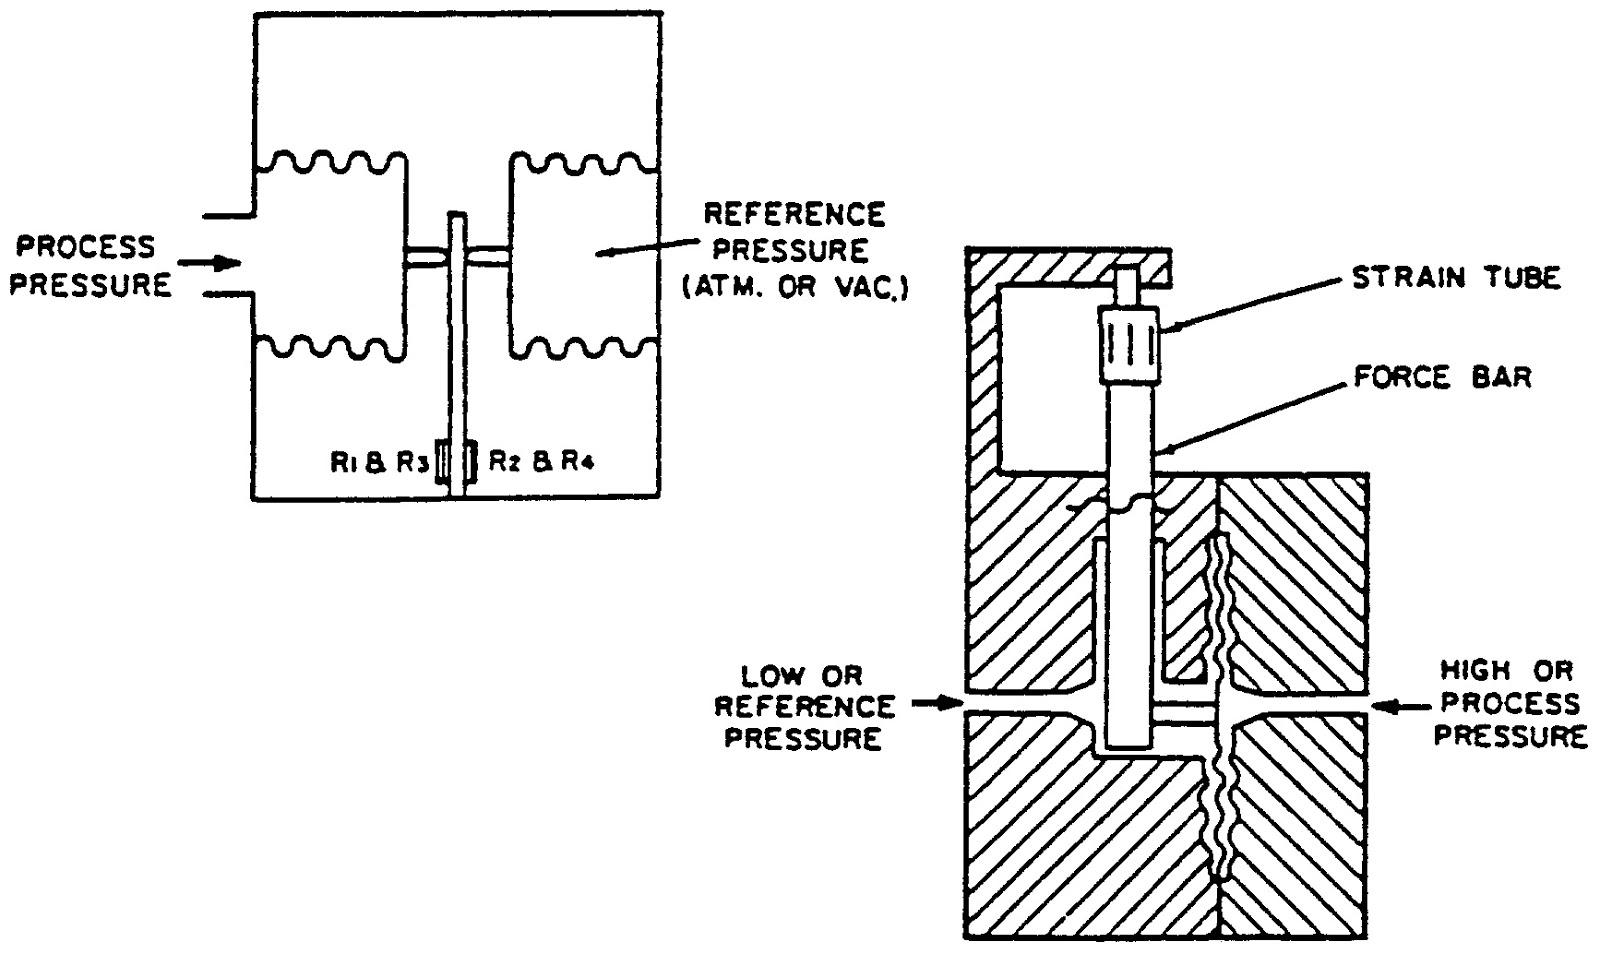 wearenaitritstaff  pressure sensors and transmitters